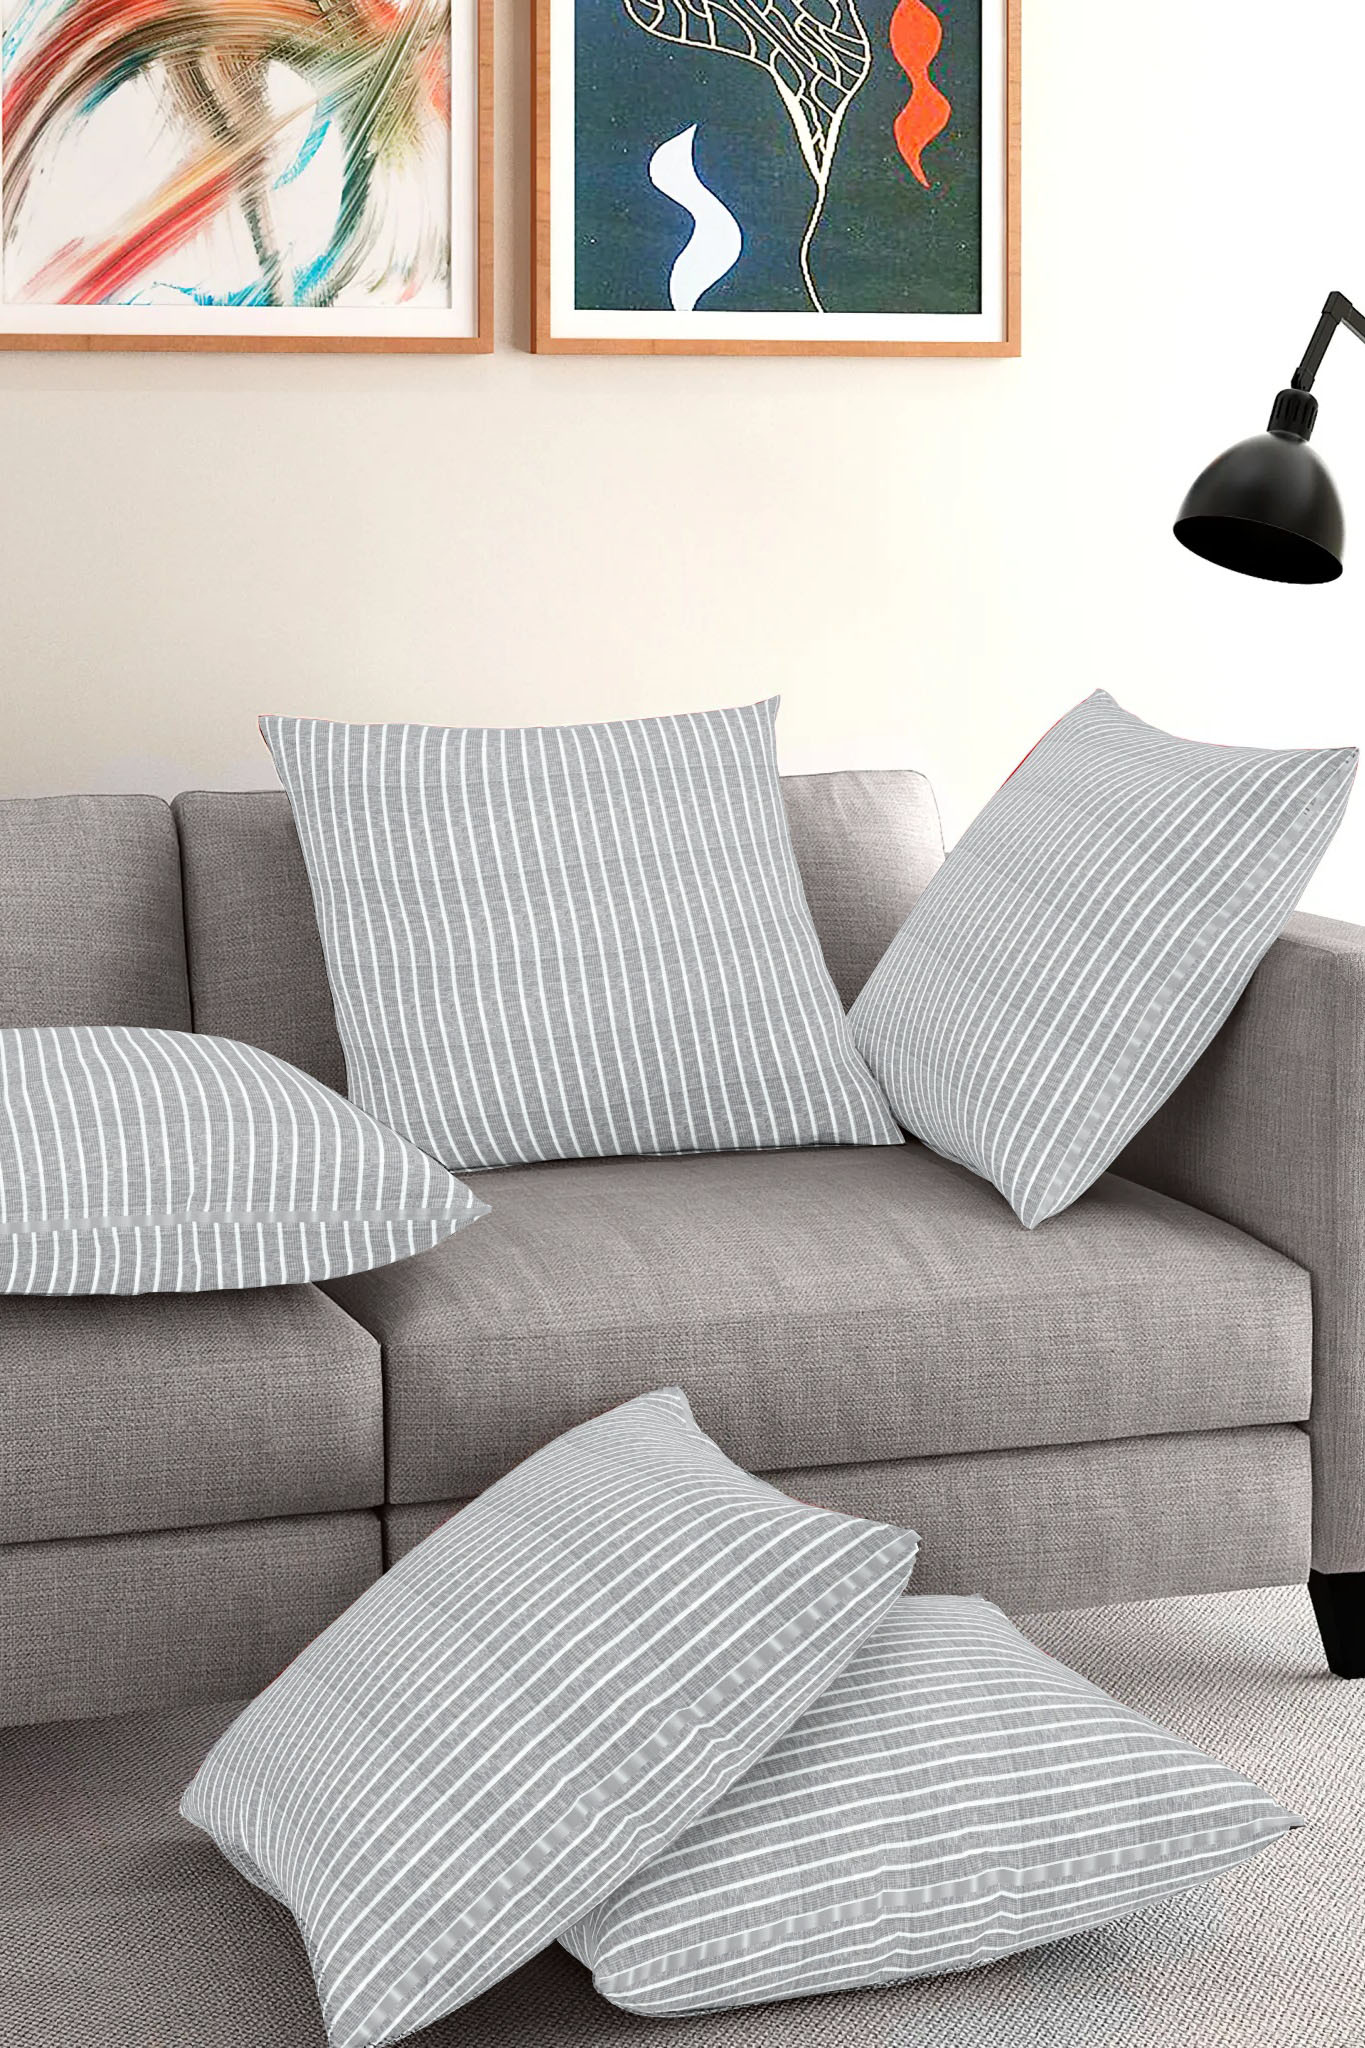 /home/customer/www/fabartcraft.com/public_html/uploadshttps://www.shopolics.com/uploads/images/medium/Gray-White-Cotton-Cushion-Cover-35392.jpg